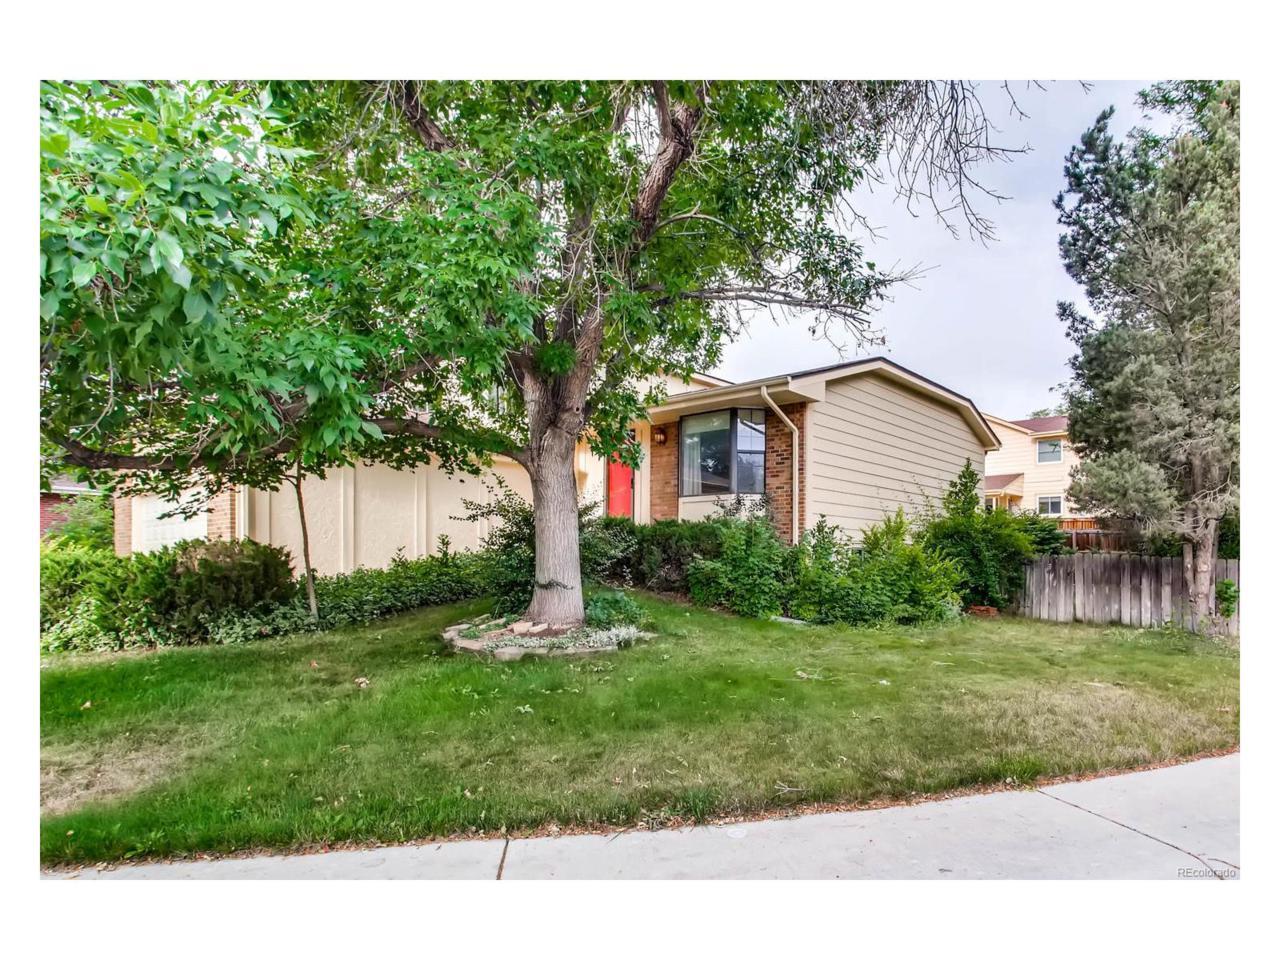 2009 S Fairplay Street, Aurora, CO 80014 (MLS #7868981) :: 8z Real Estate